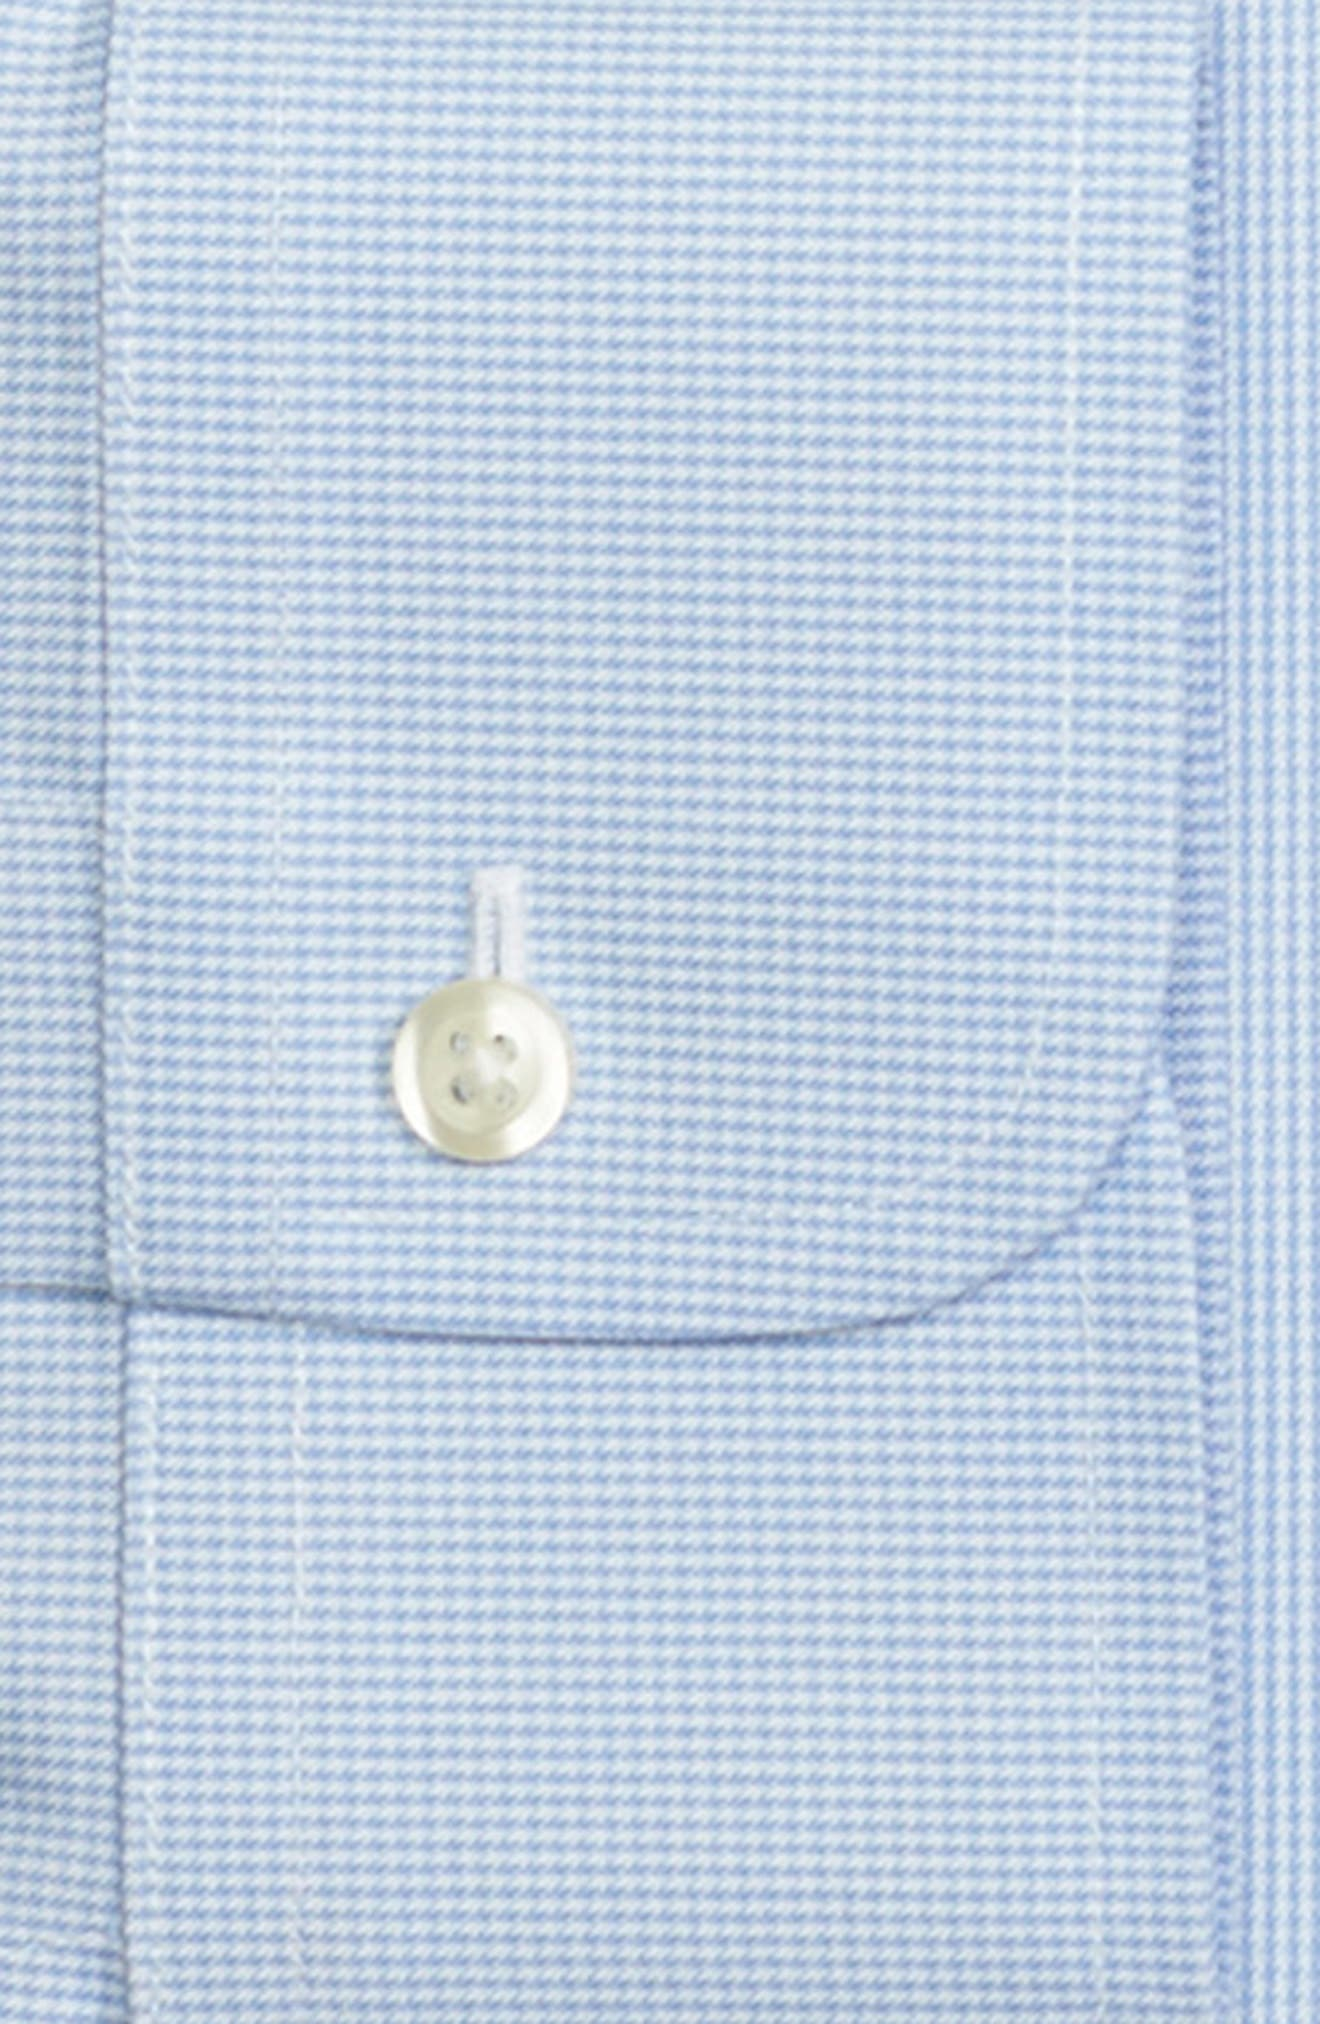 Classic Fit Houndstooth Dress Shirt,                             Alternate thumbnail 2, color,                             LIGHT/ PASTEL BLUE